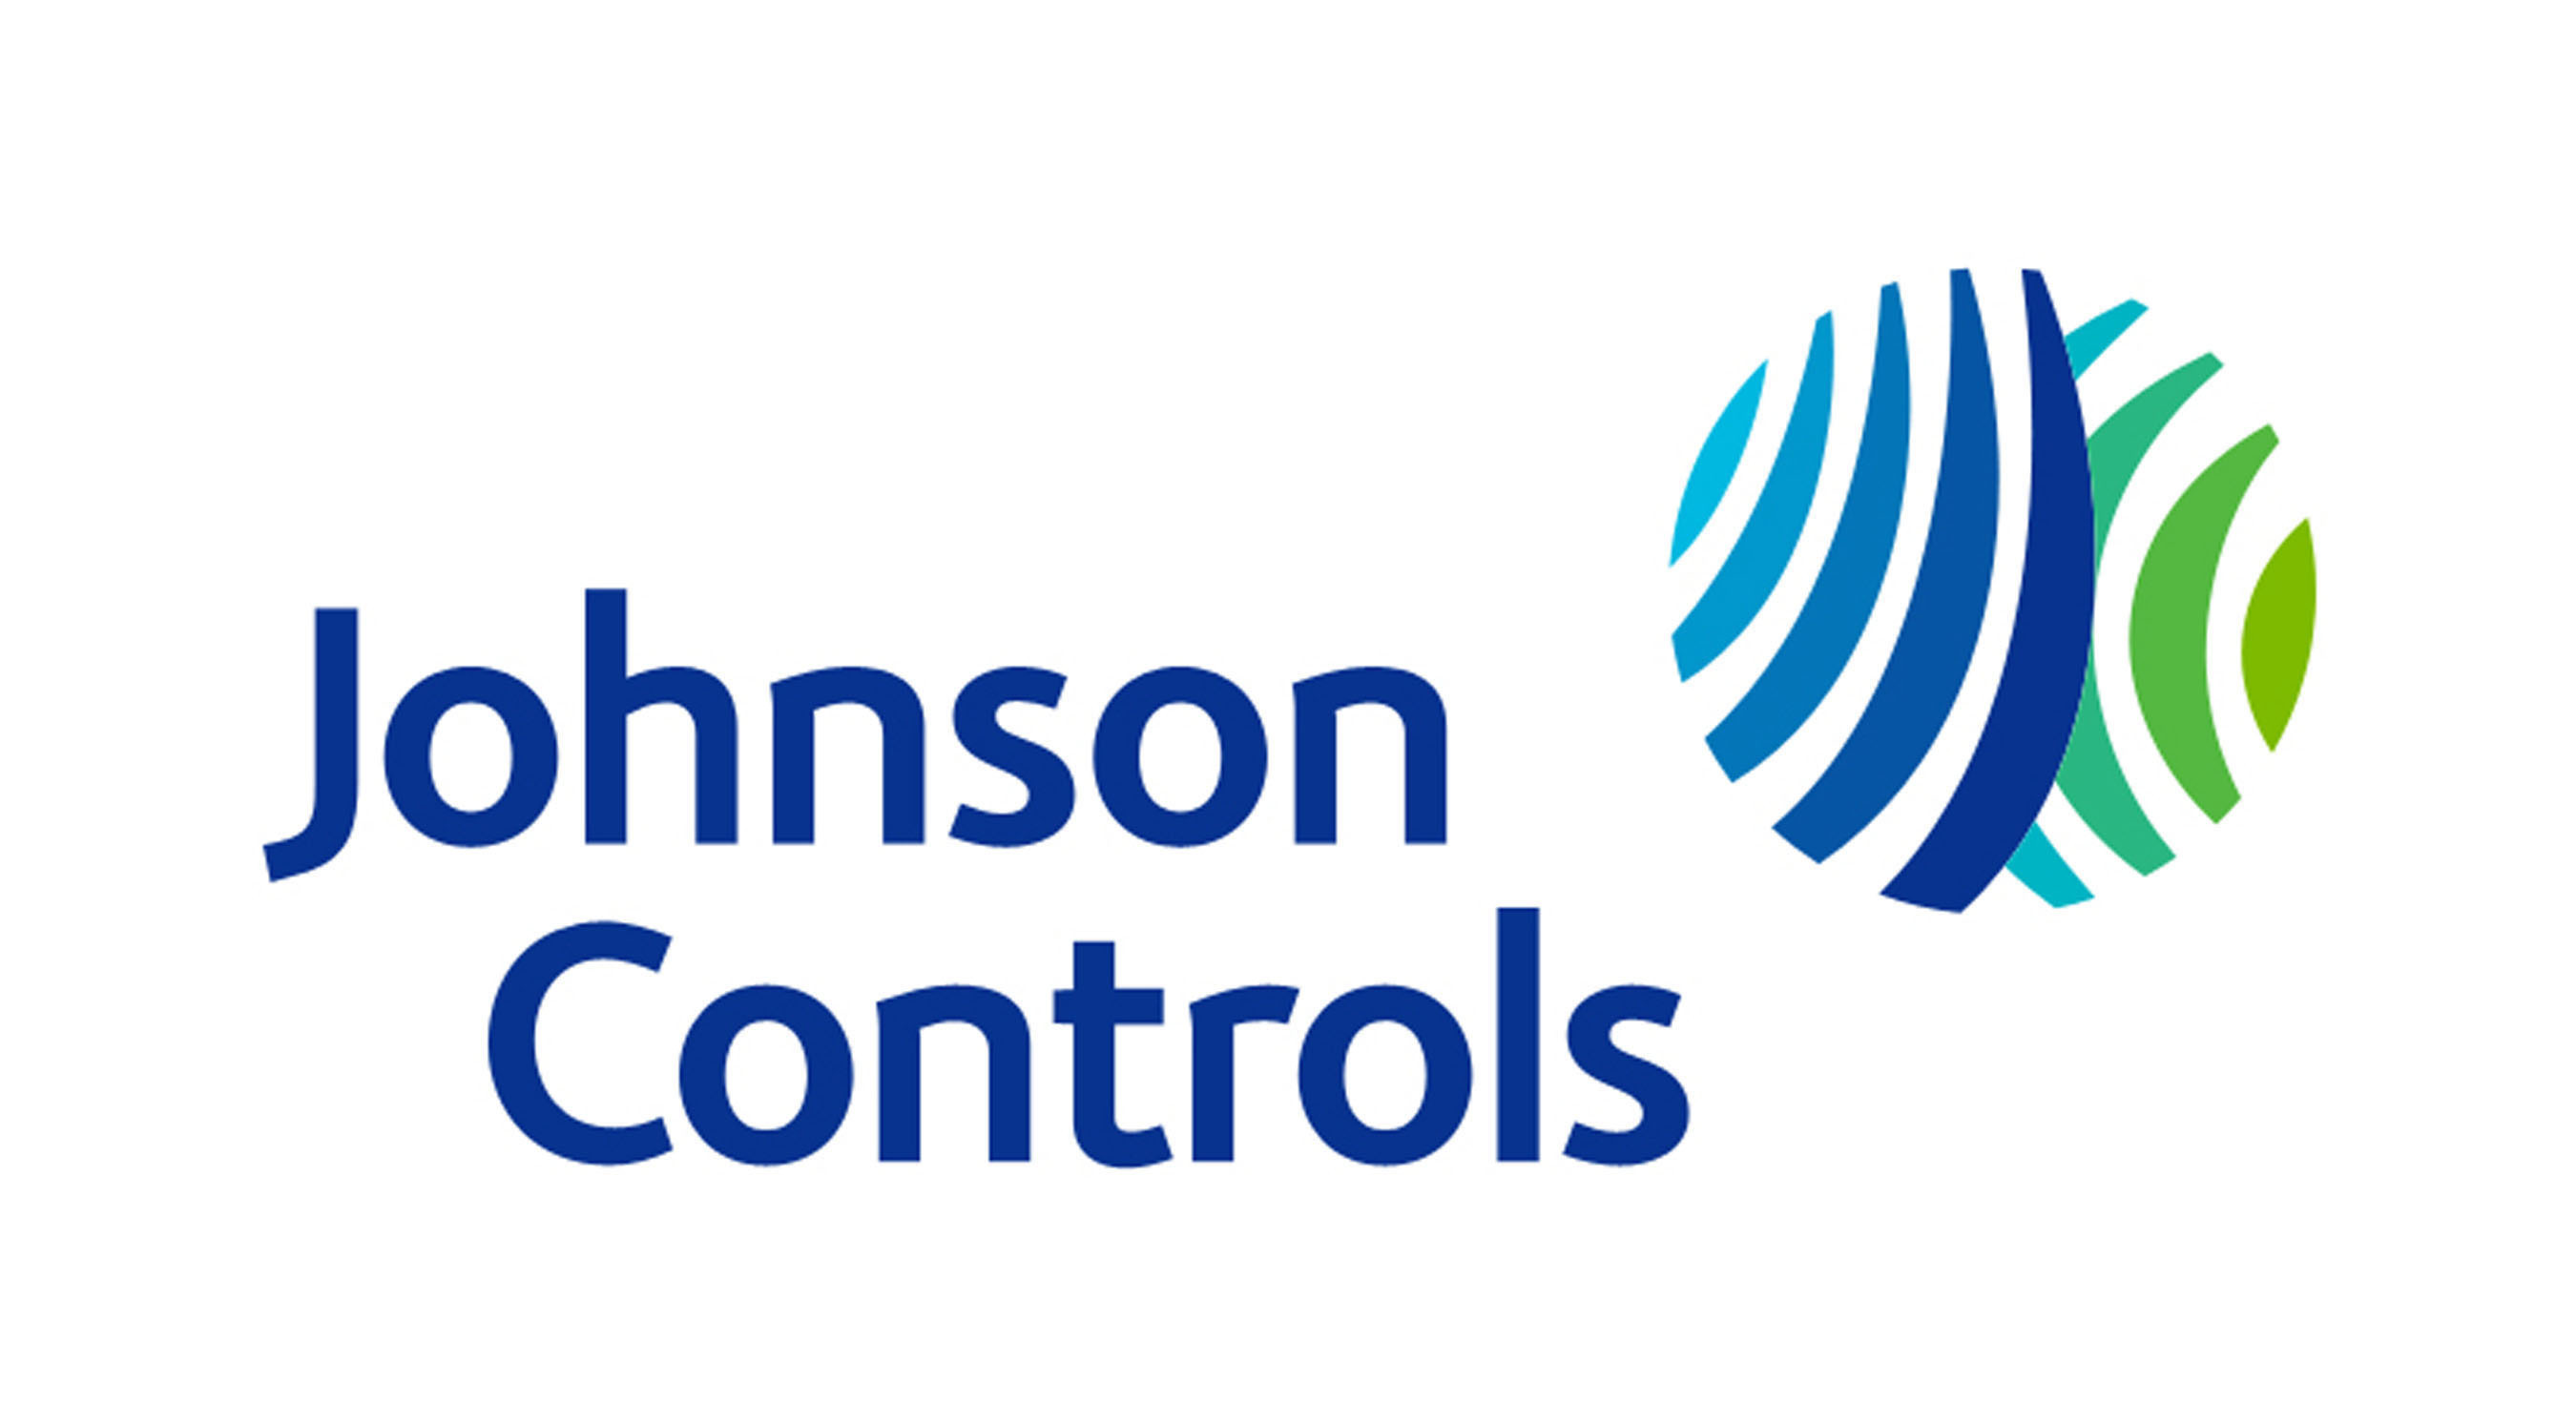 Johnson controls international книга forex для дураков